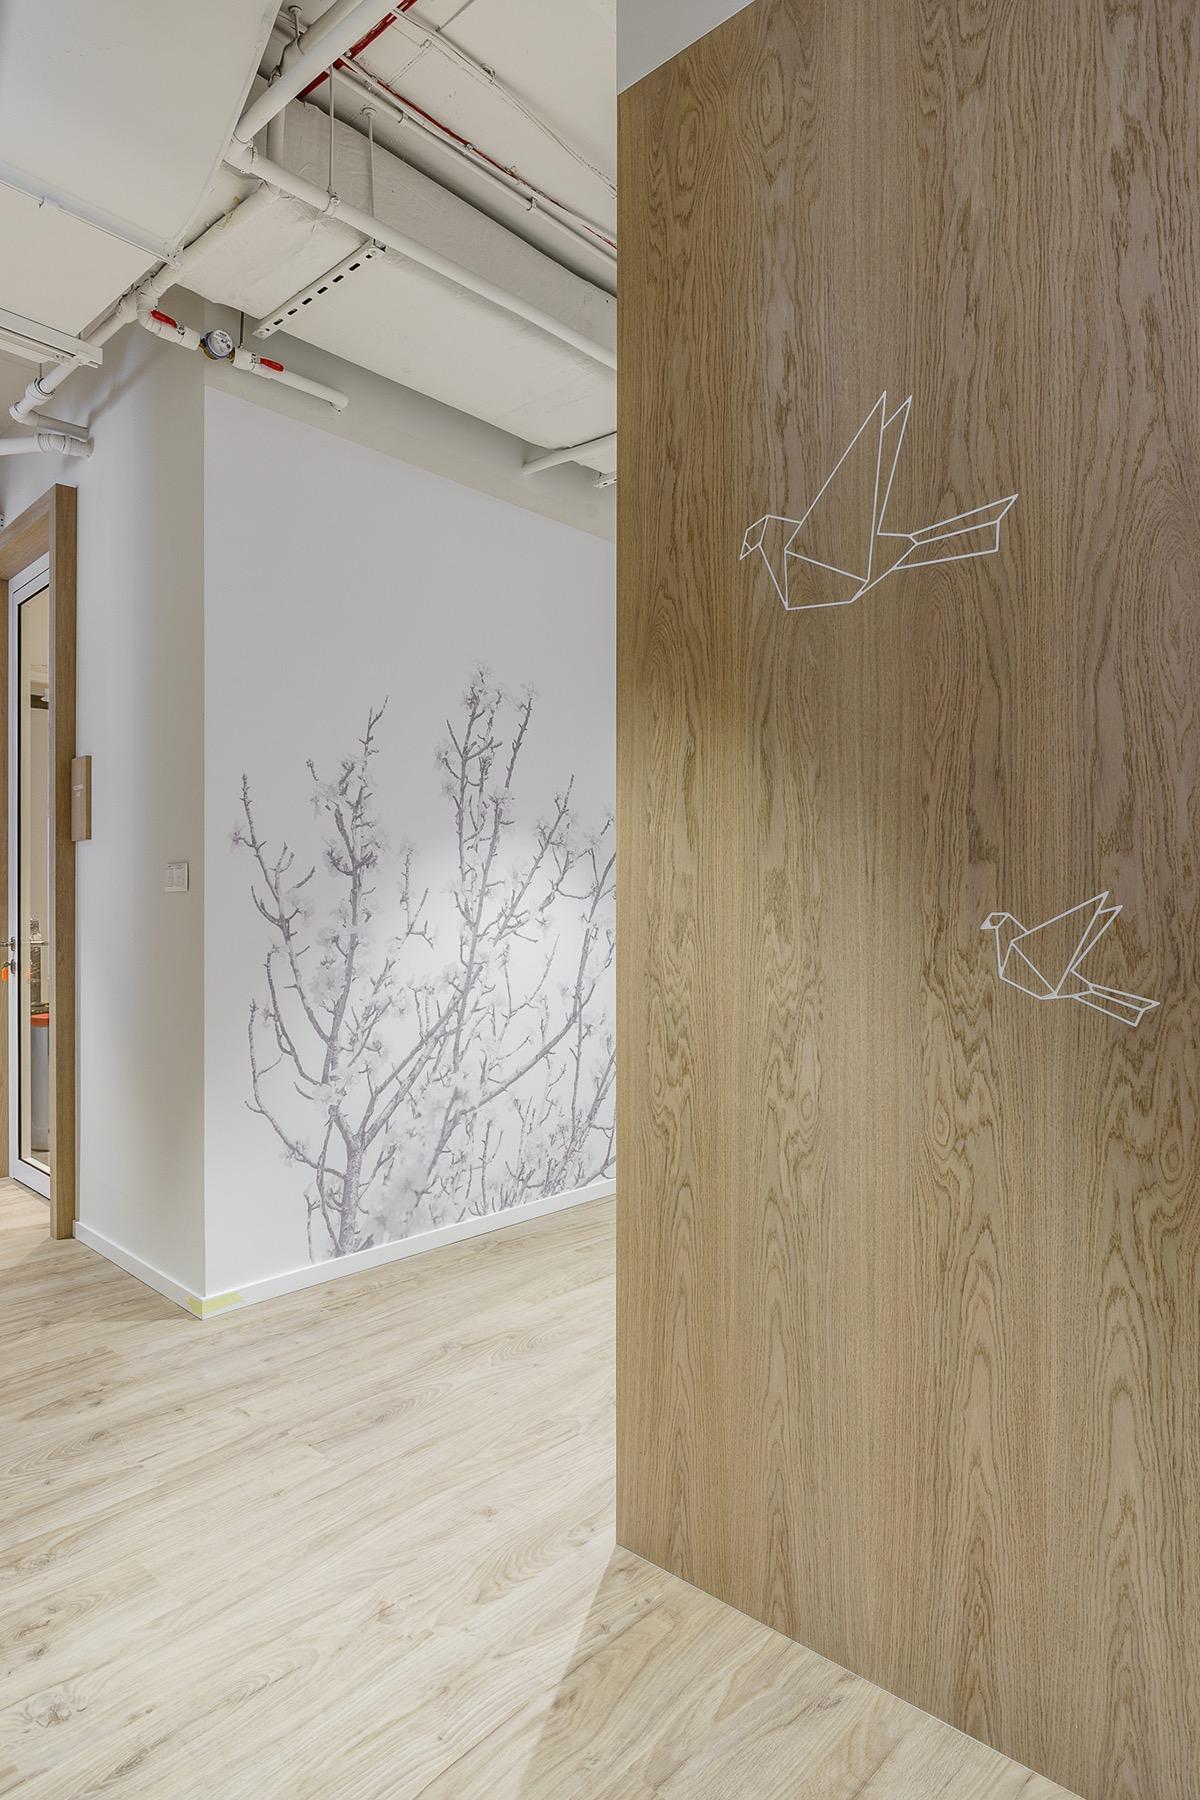 takeda-warsaw-office-7